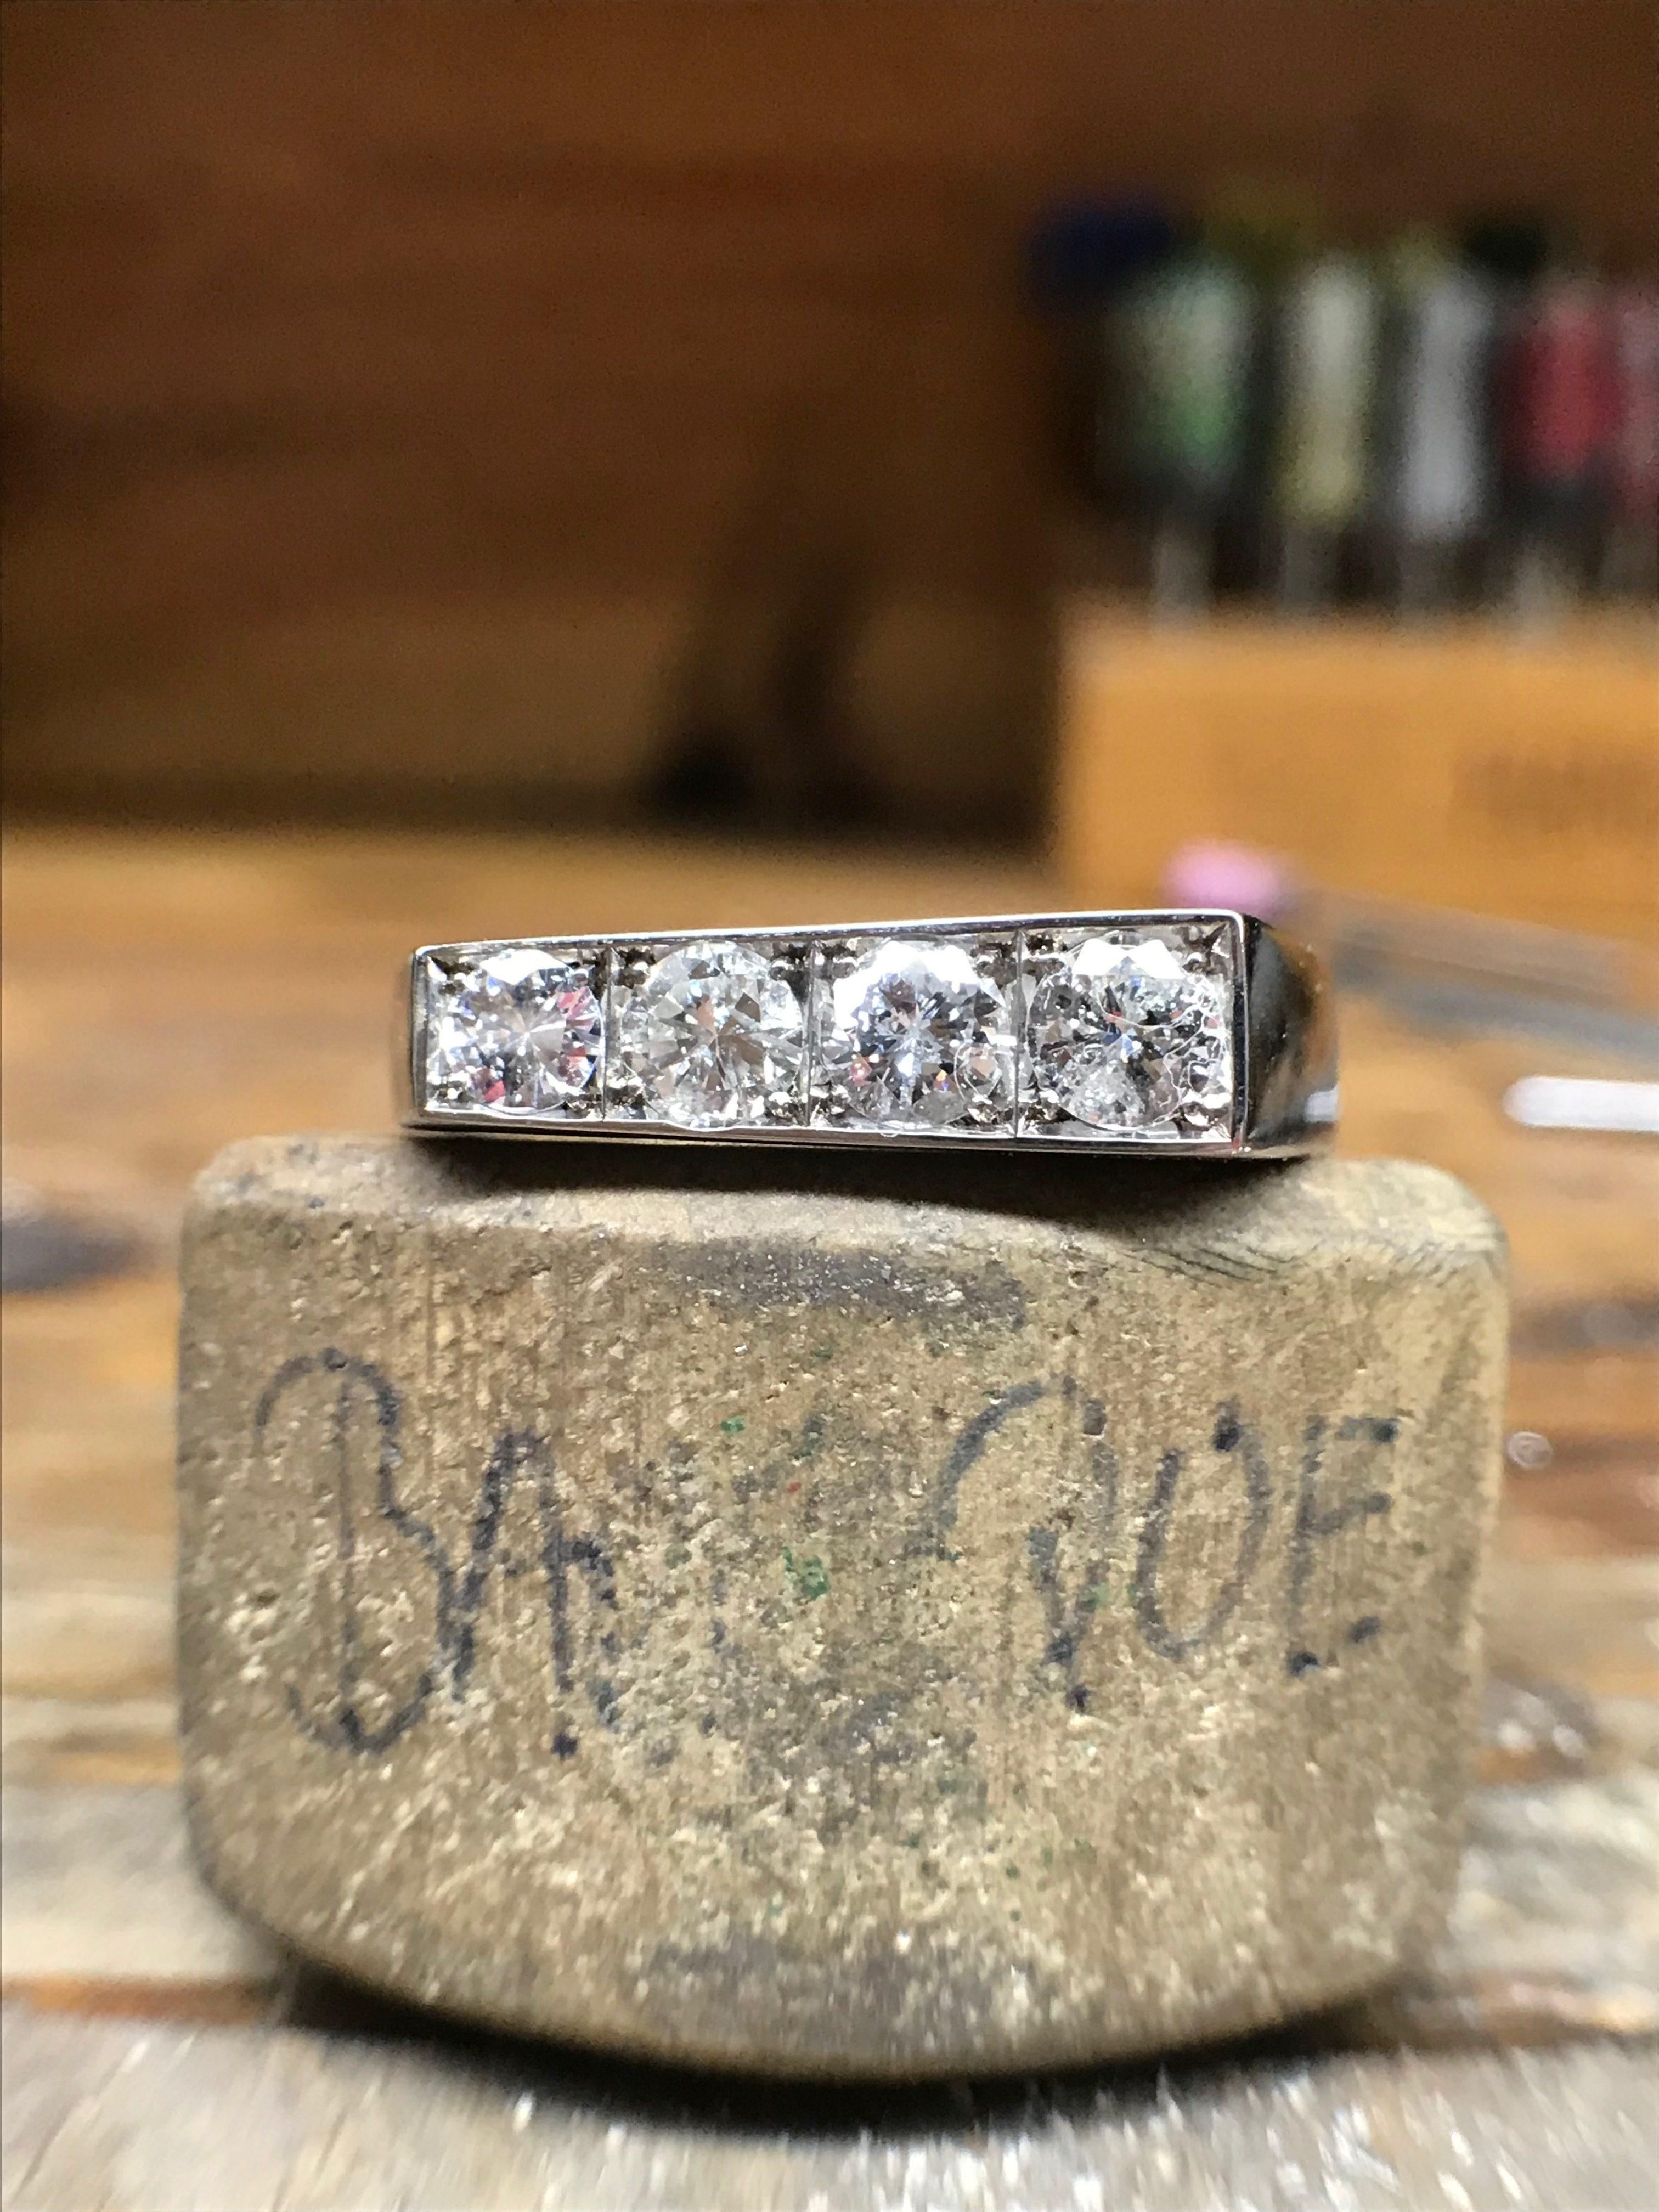 Bespoke diamond wedge ring